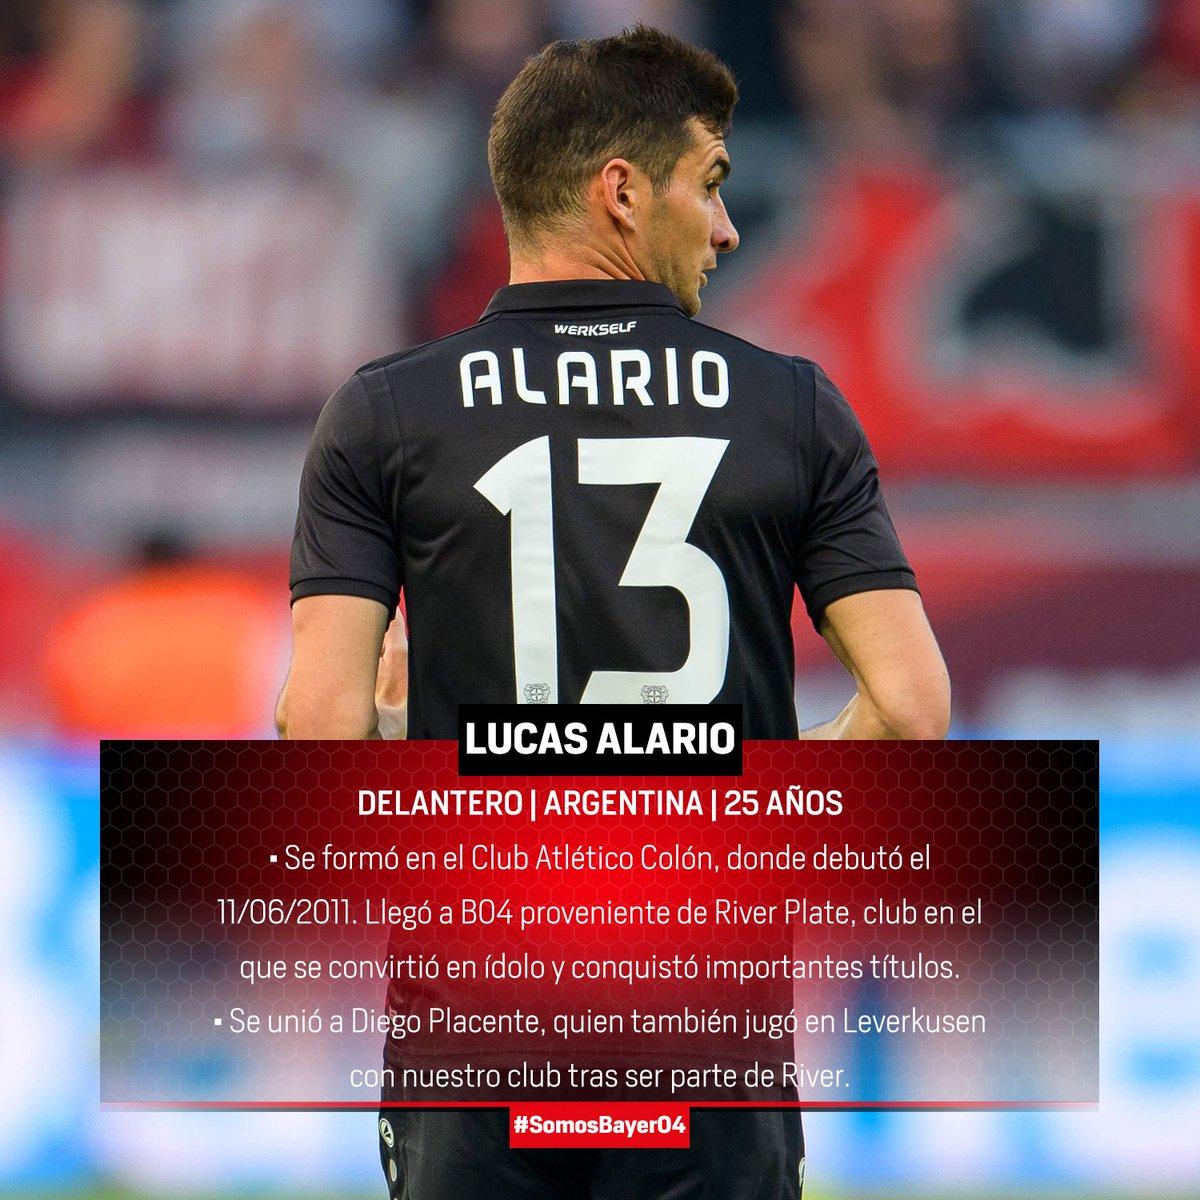 Camiseta Bayer 04 Leverkusen Lucas Alario